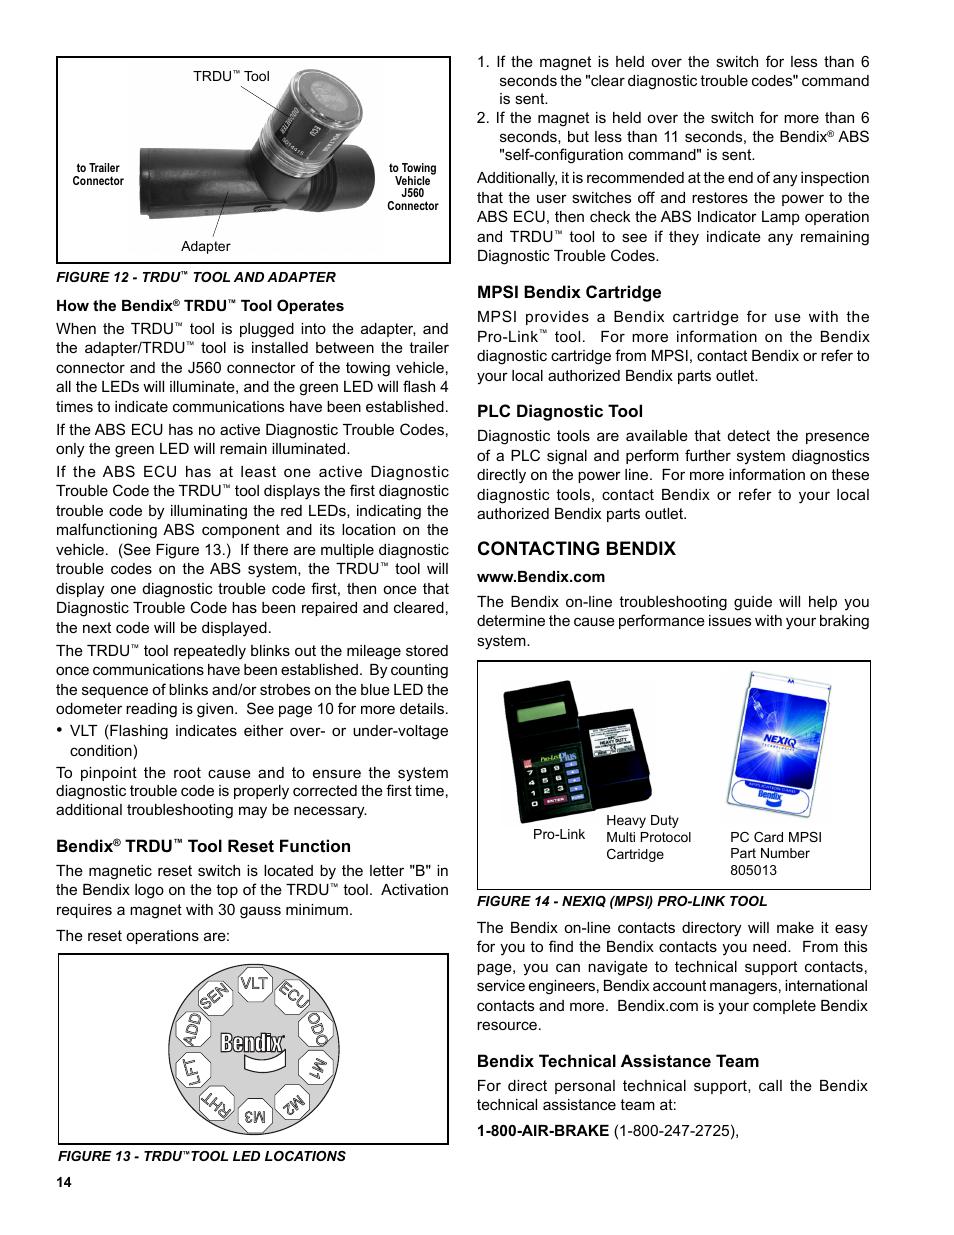 Contacting bendix | Bendix Commercial Vehicle Systems TABS-6